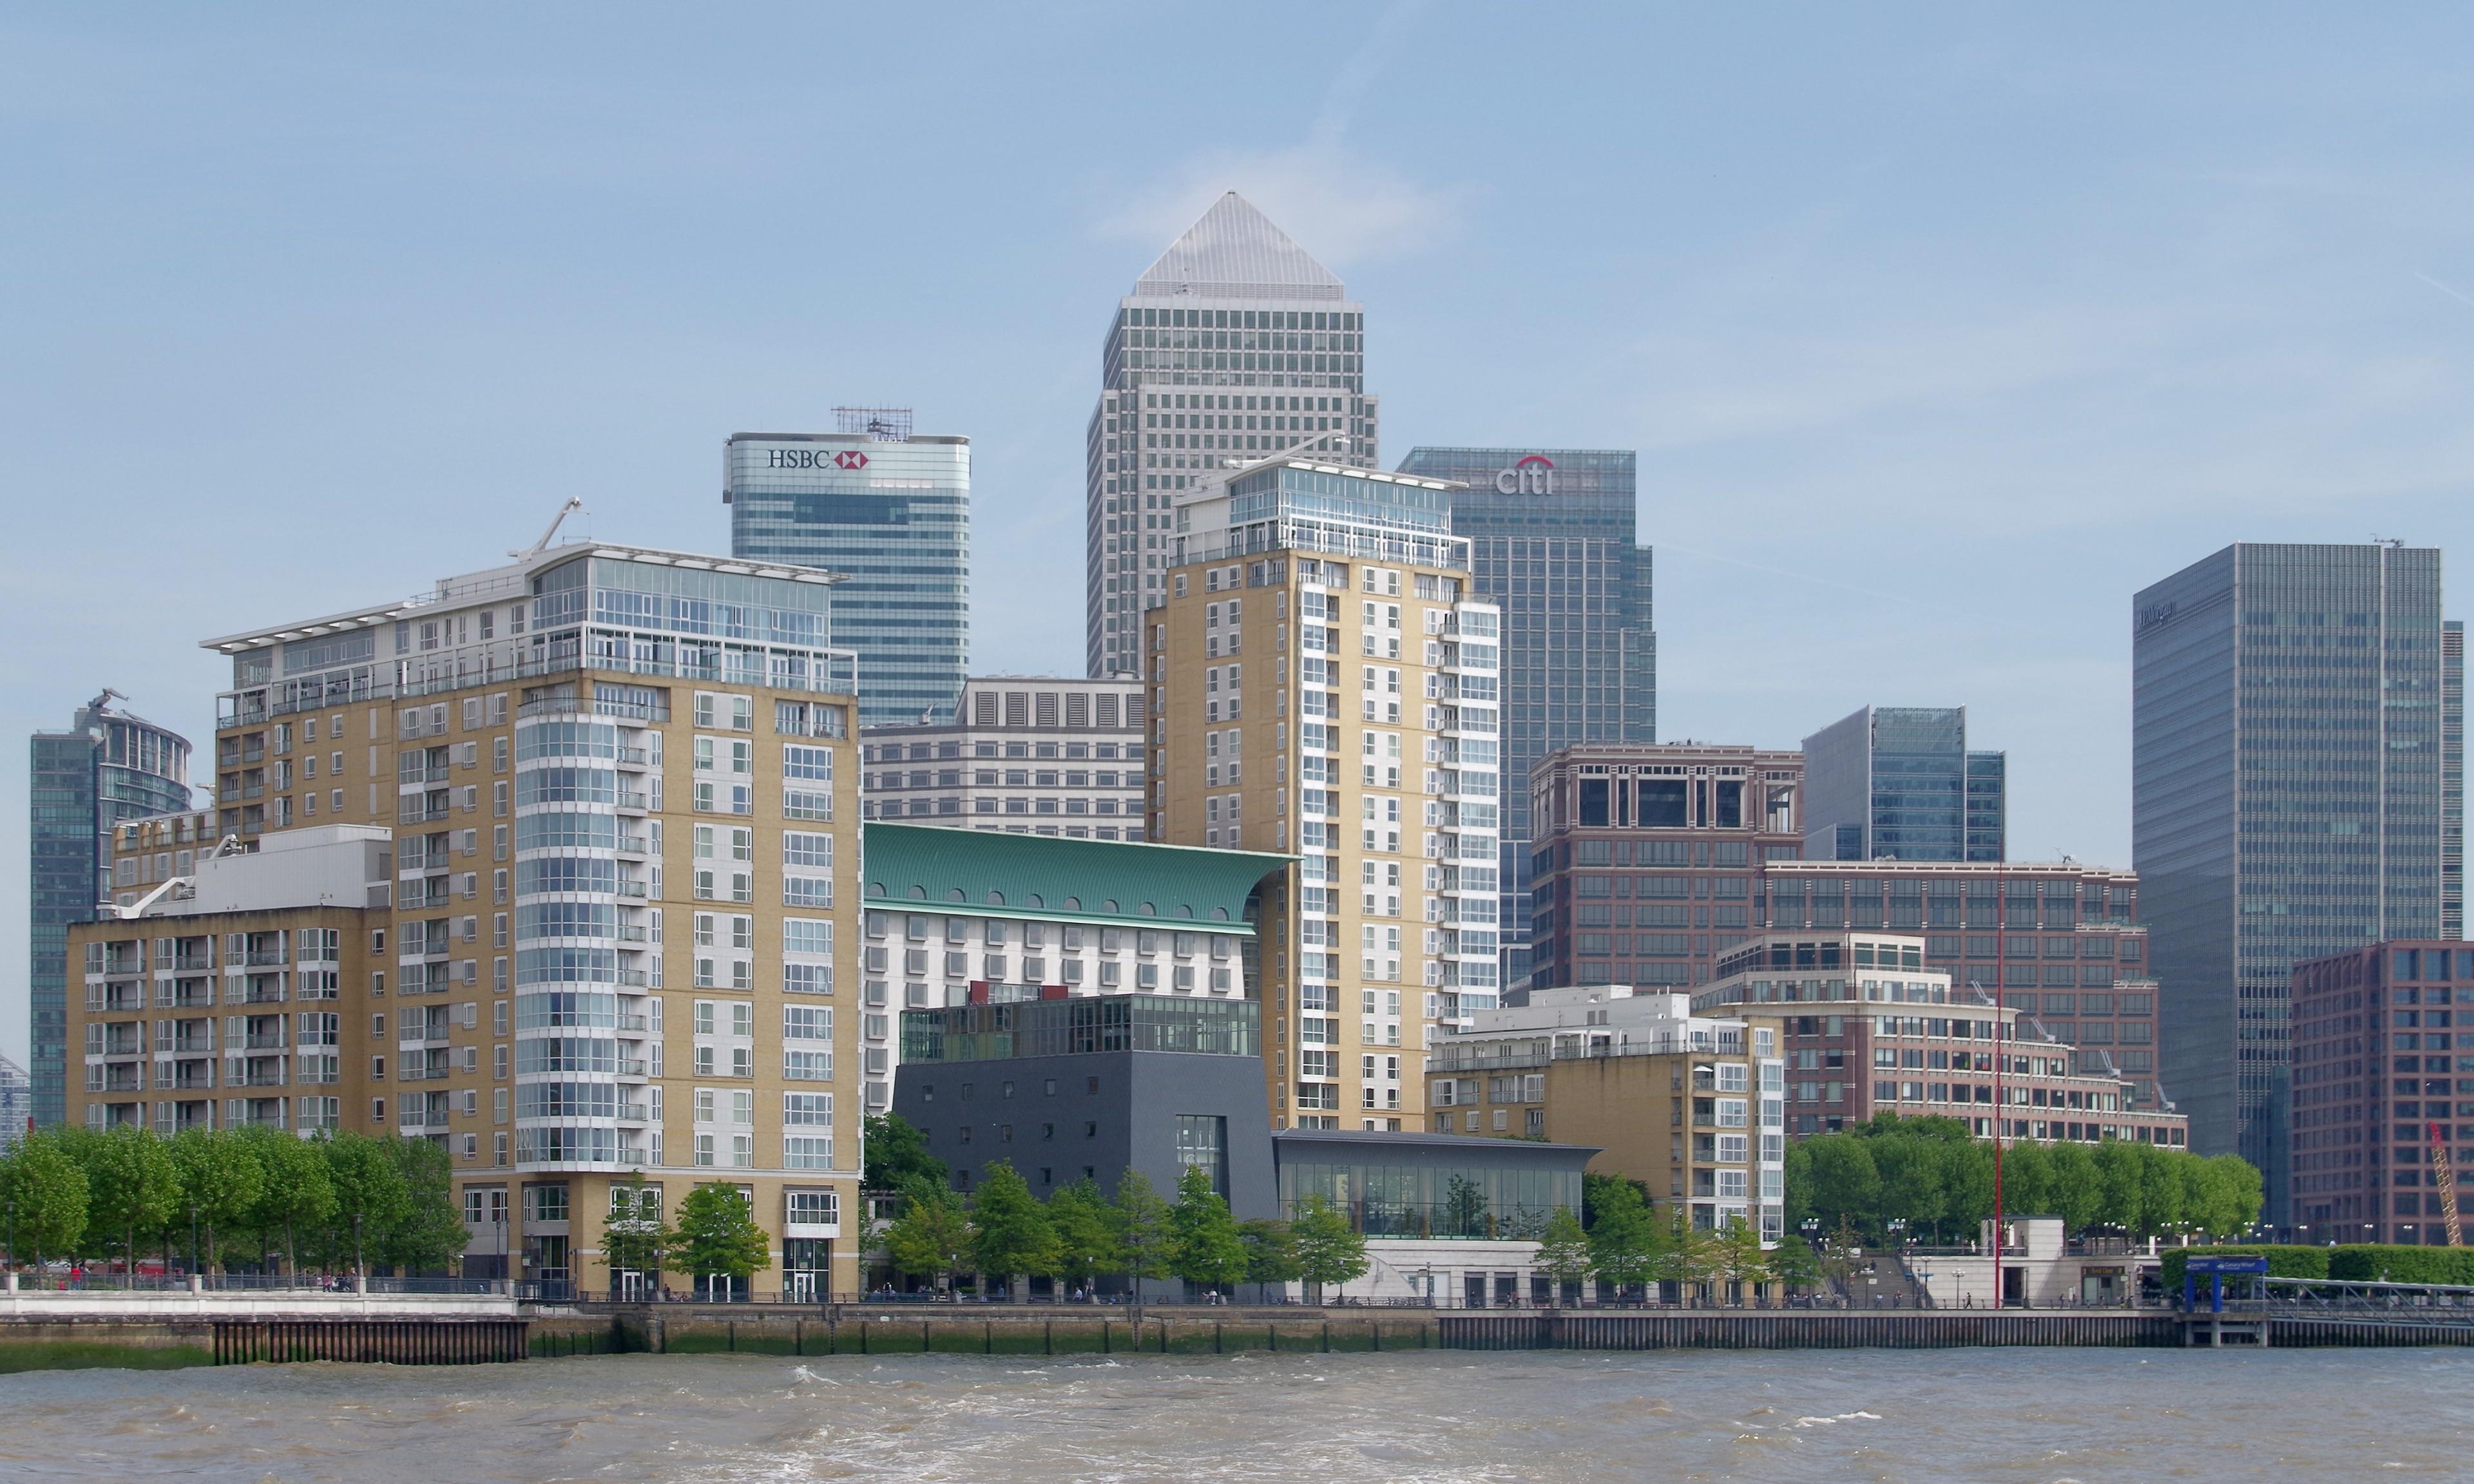 Surrey Docks, London, England, United Kingdom